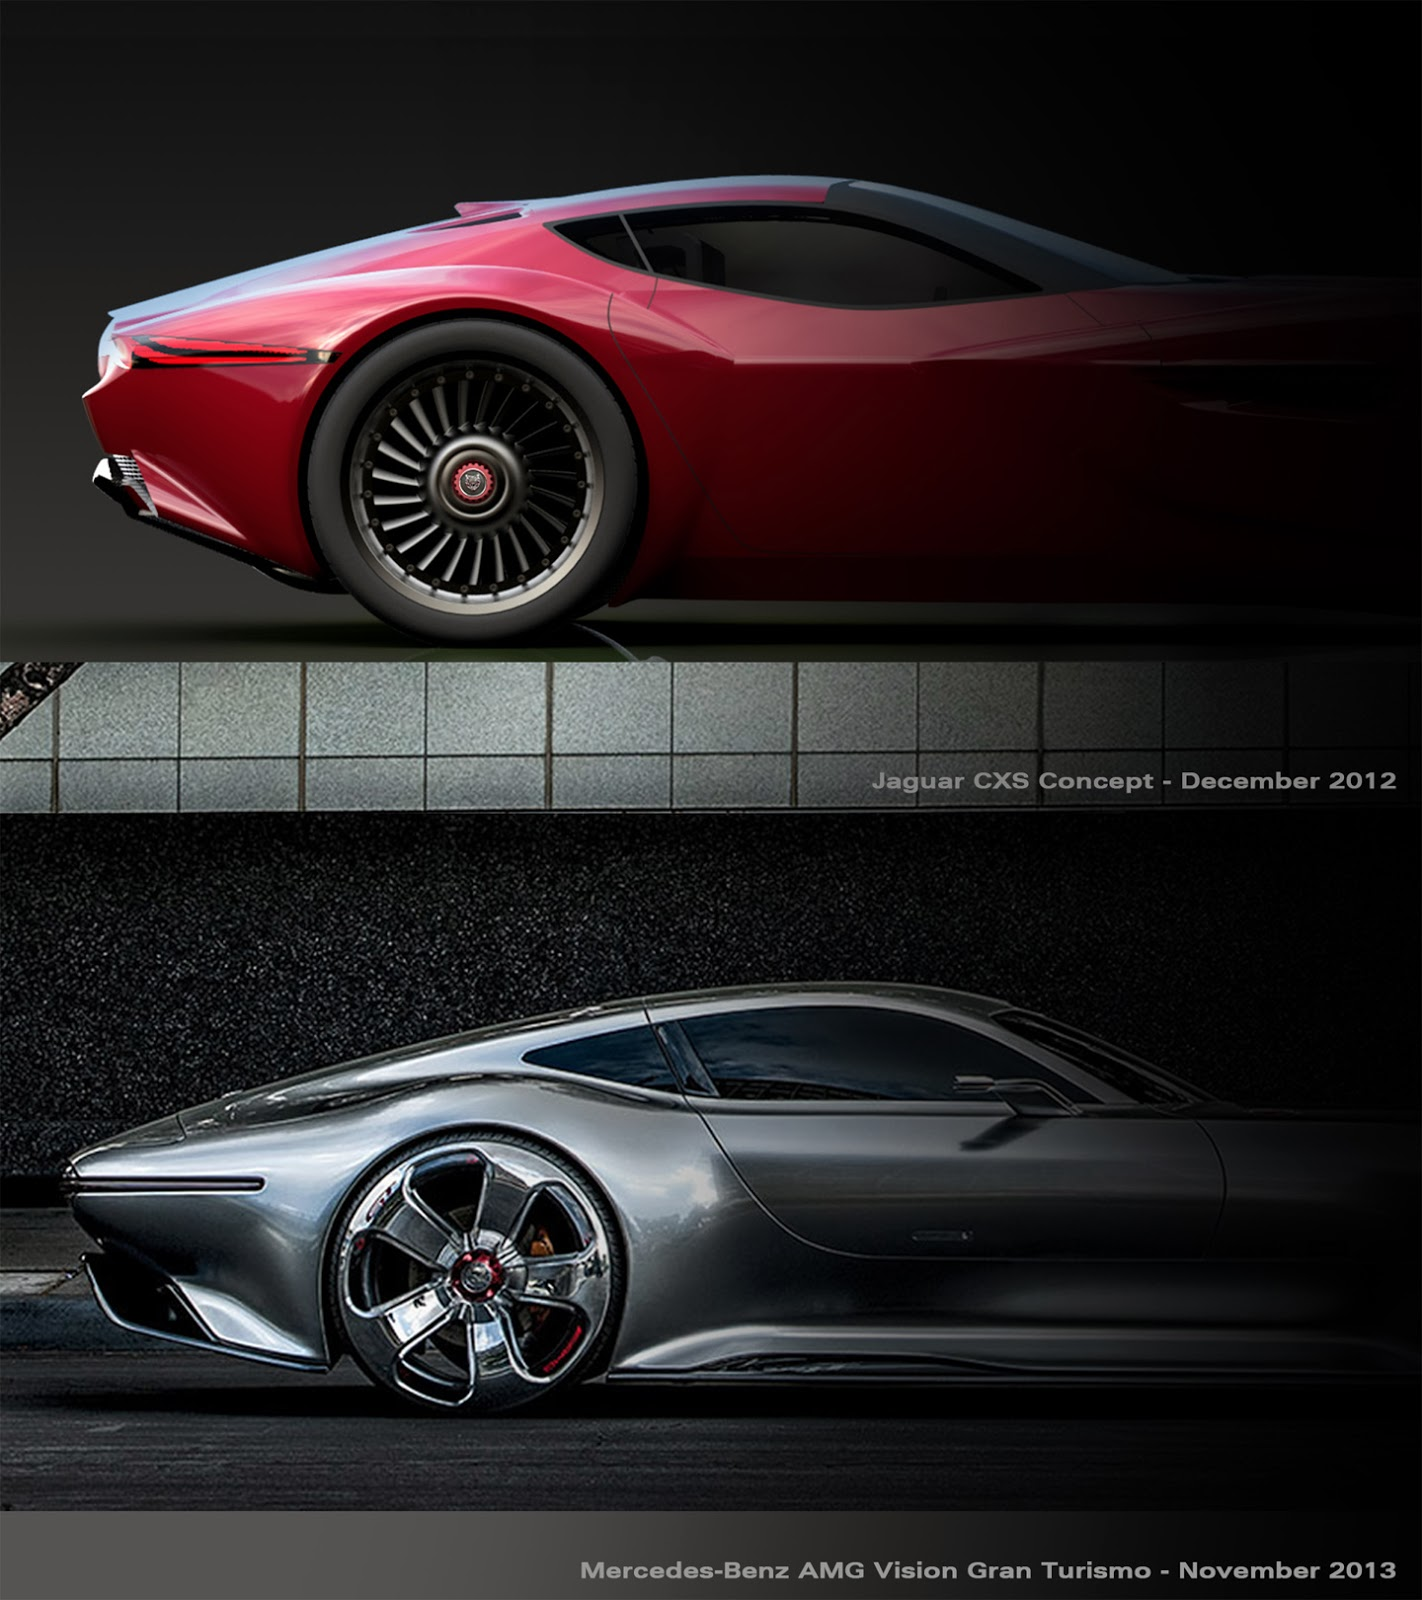 Jaguar cxs concept vs mercedes benz amg vision gran turismo for Mercedes benz amg vision